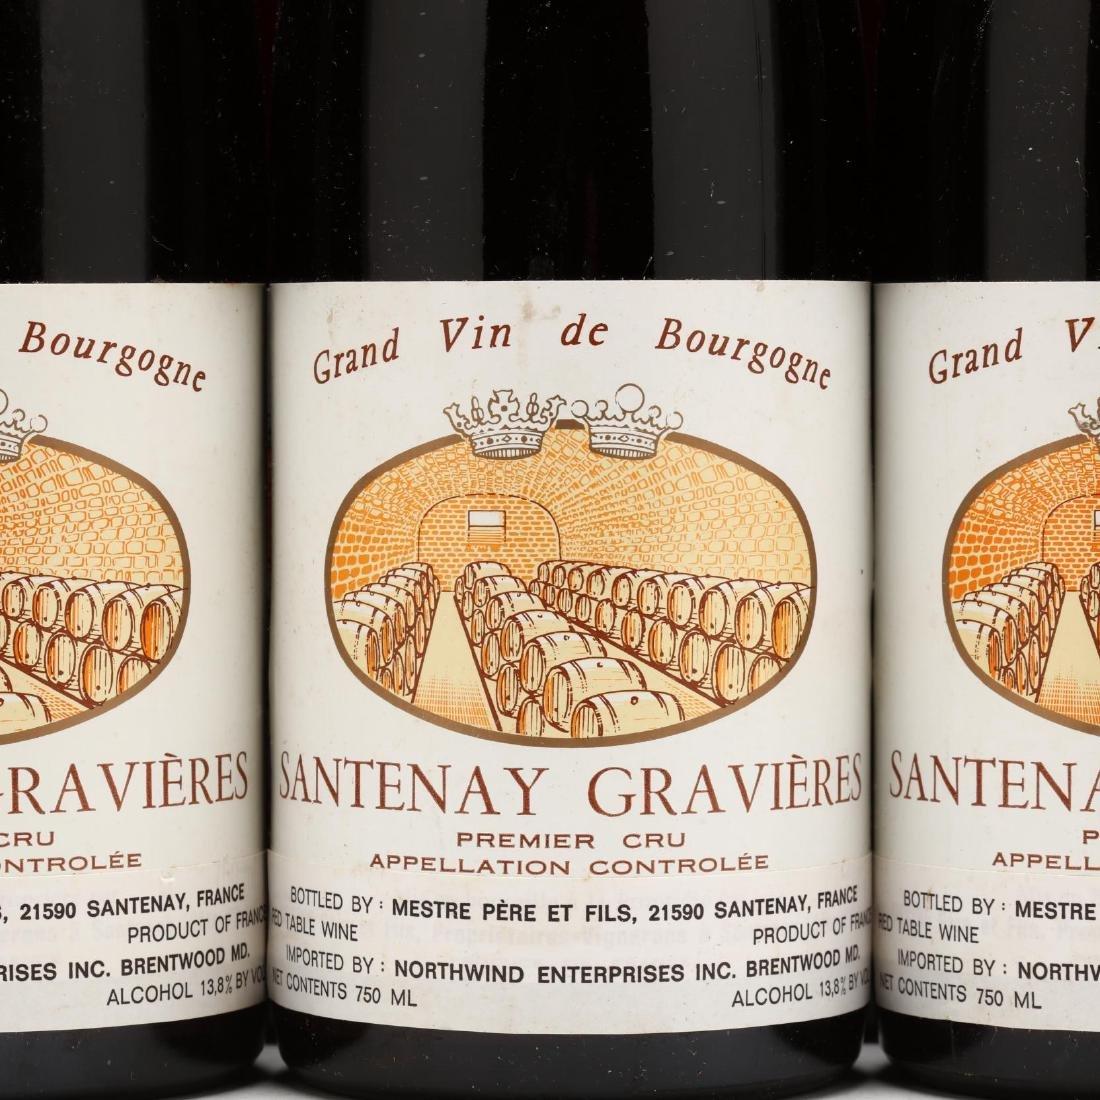 Santenay Gravieres - Vintage 1983 - 2